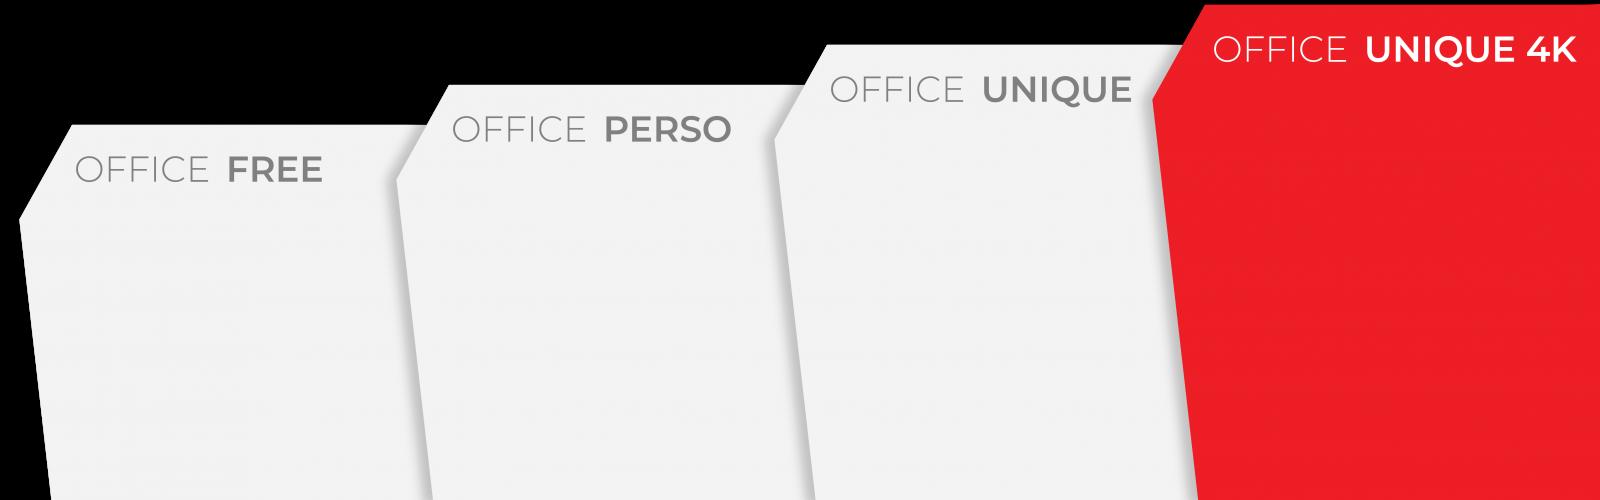 Office_Unique_4K_Hero2